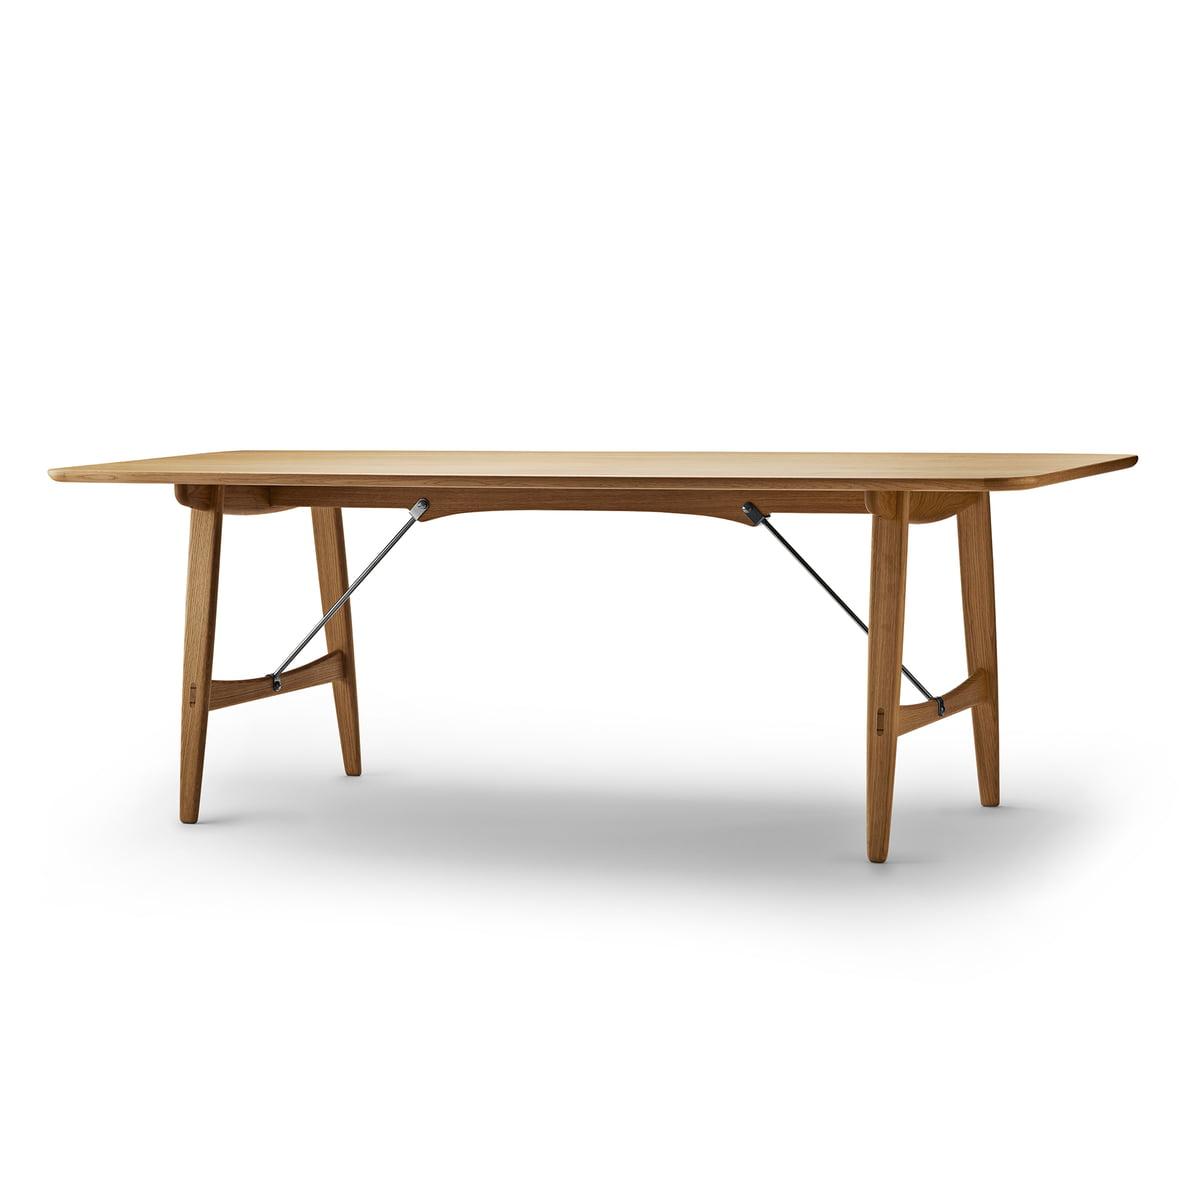 Carl Hansen Bm1160 Hunting Dining Table 210 X 82 Cm Oiled Oak